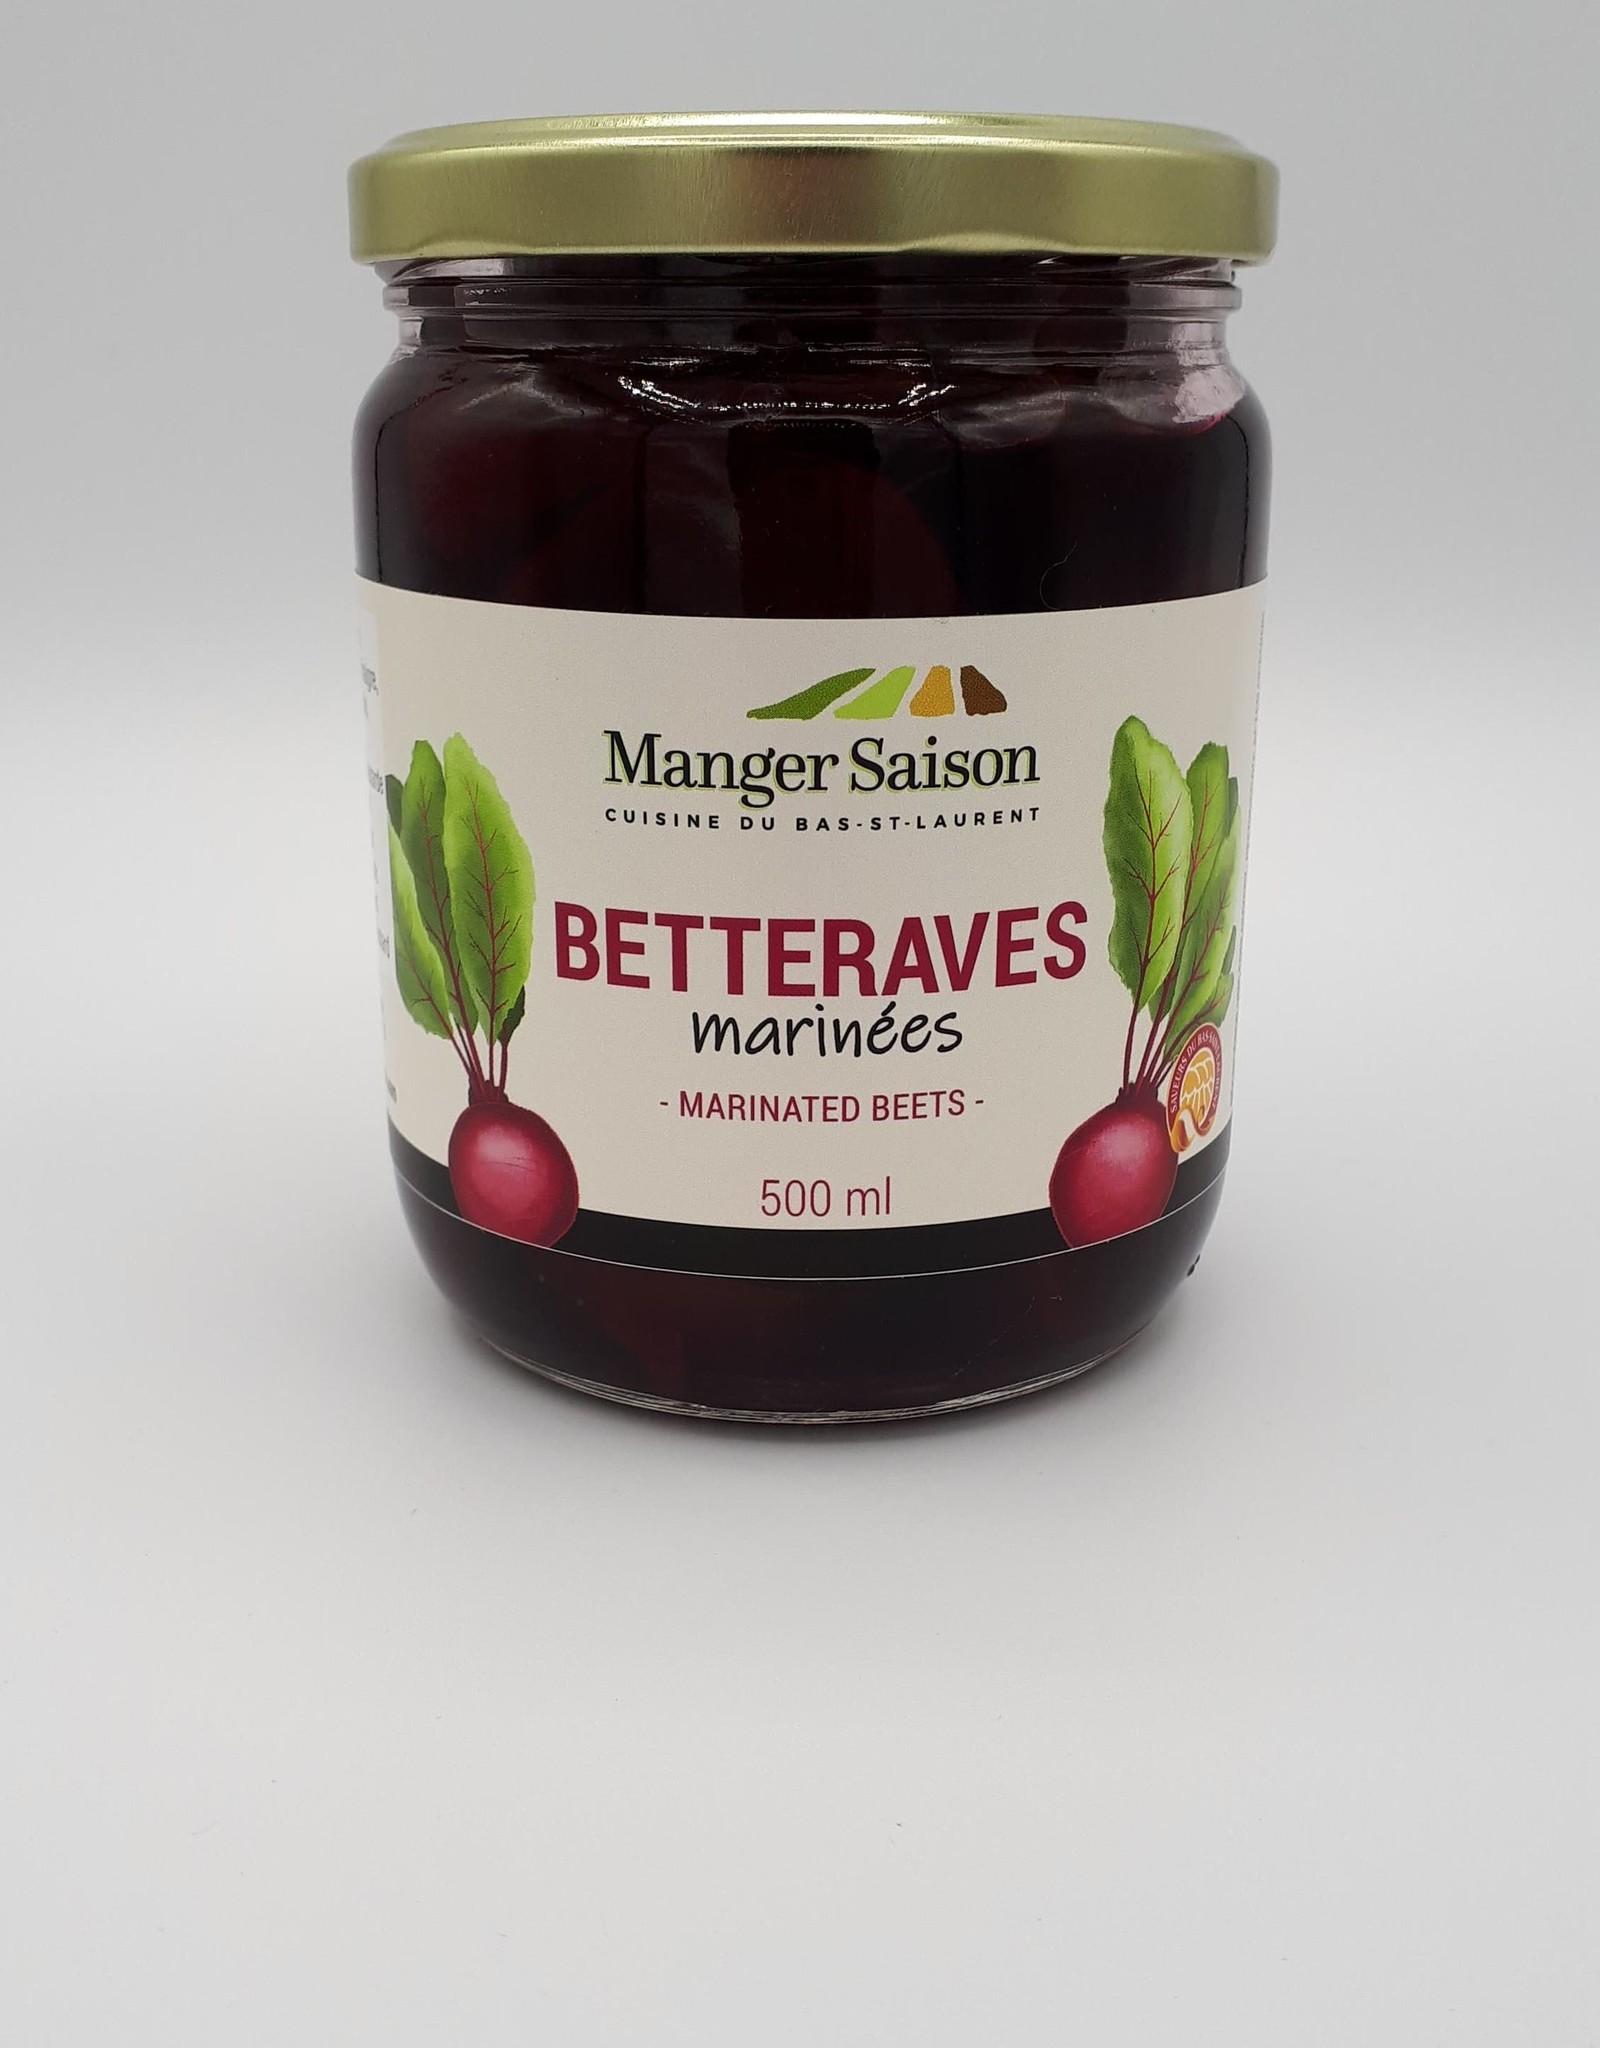 Manger Saison Manger Saison - Betteraves Marinées (500ml)